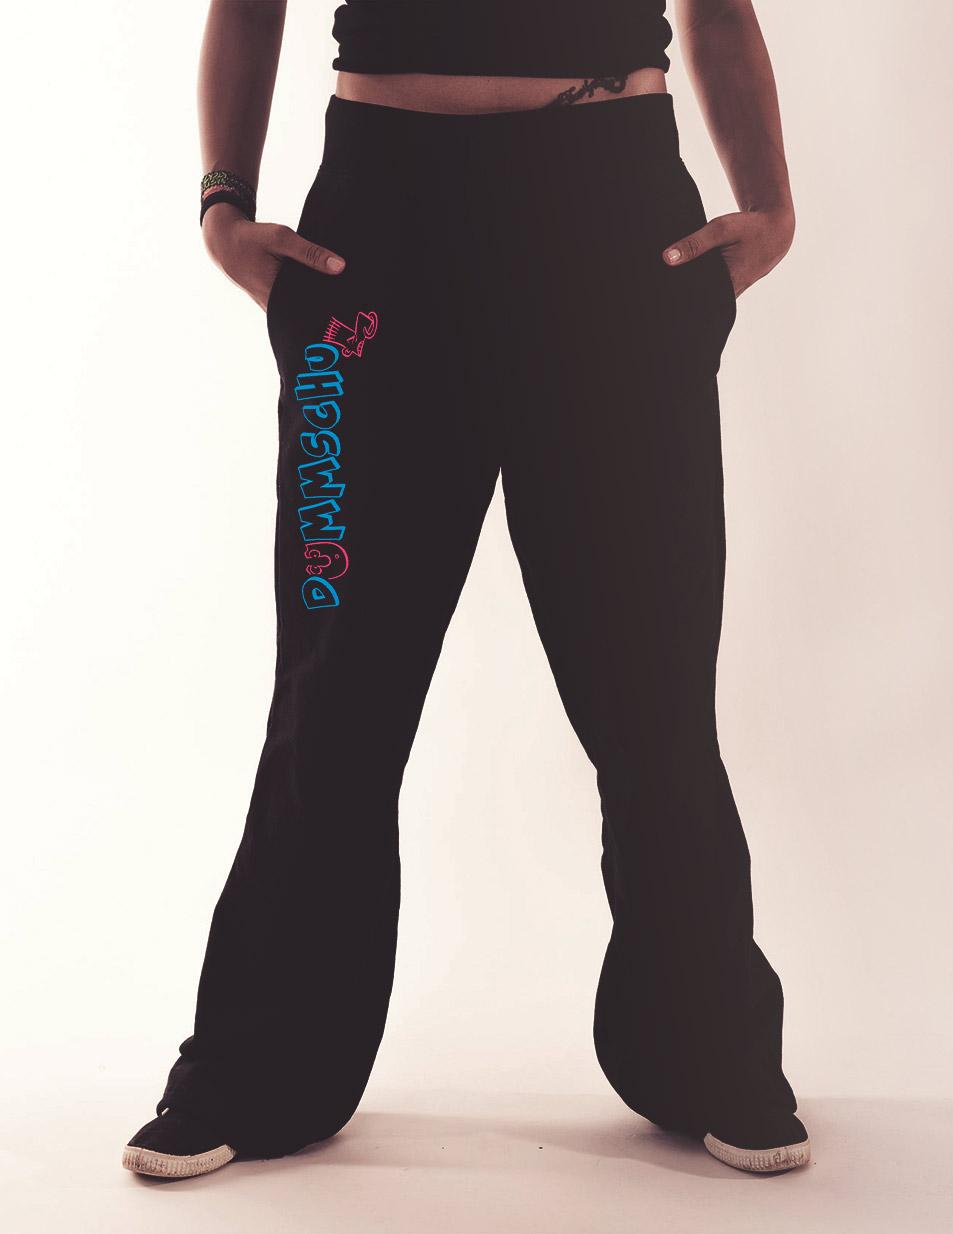 Damen-Jogginghose Dummschul mehrfarbig auf schwarz